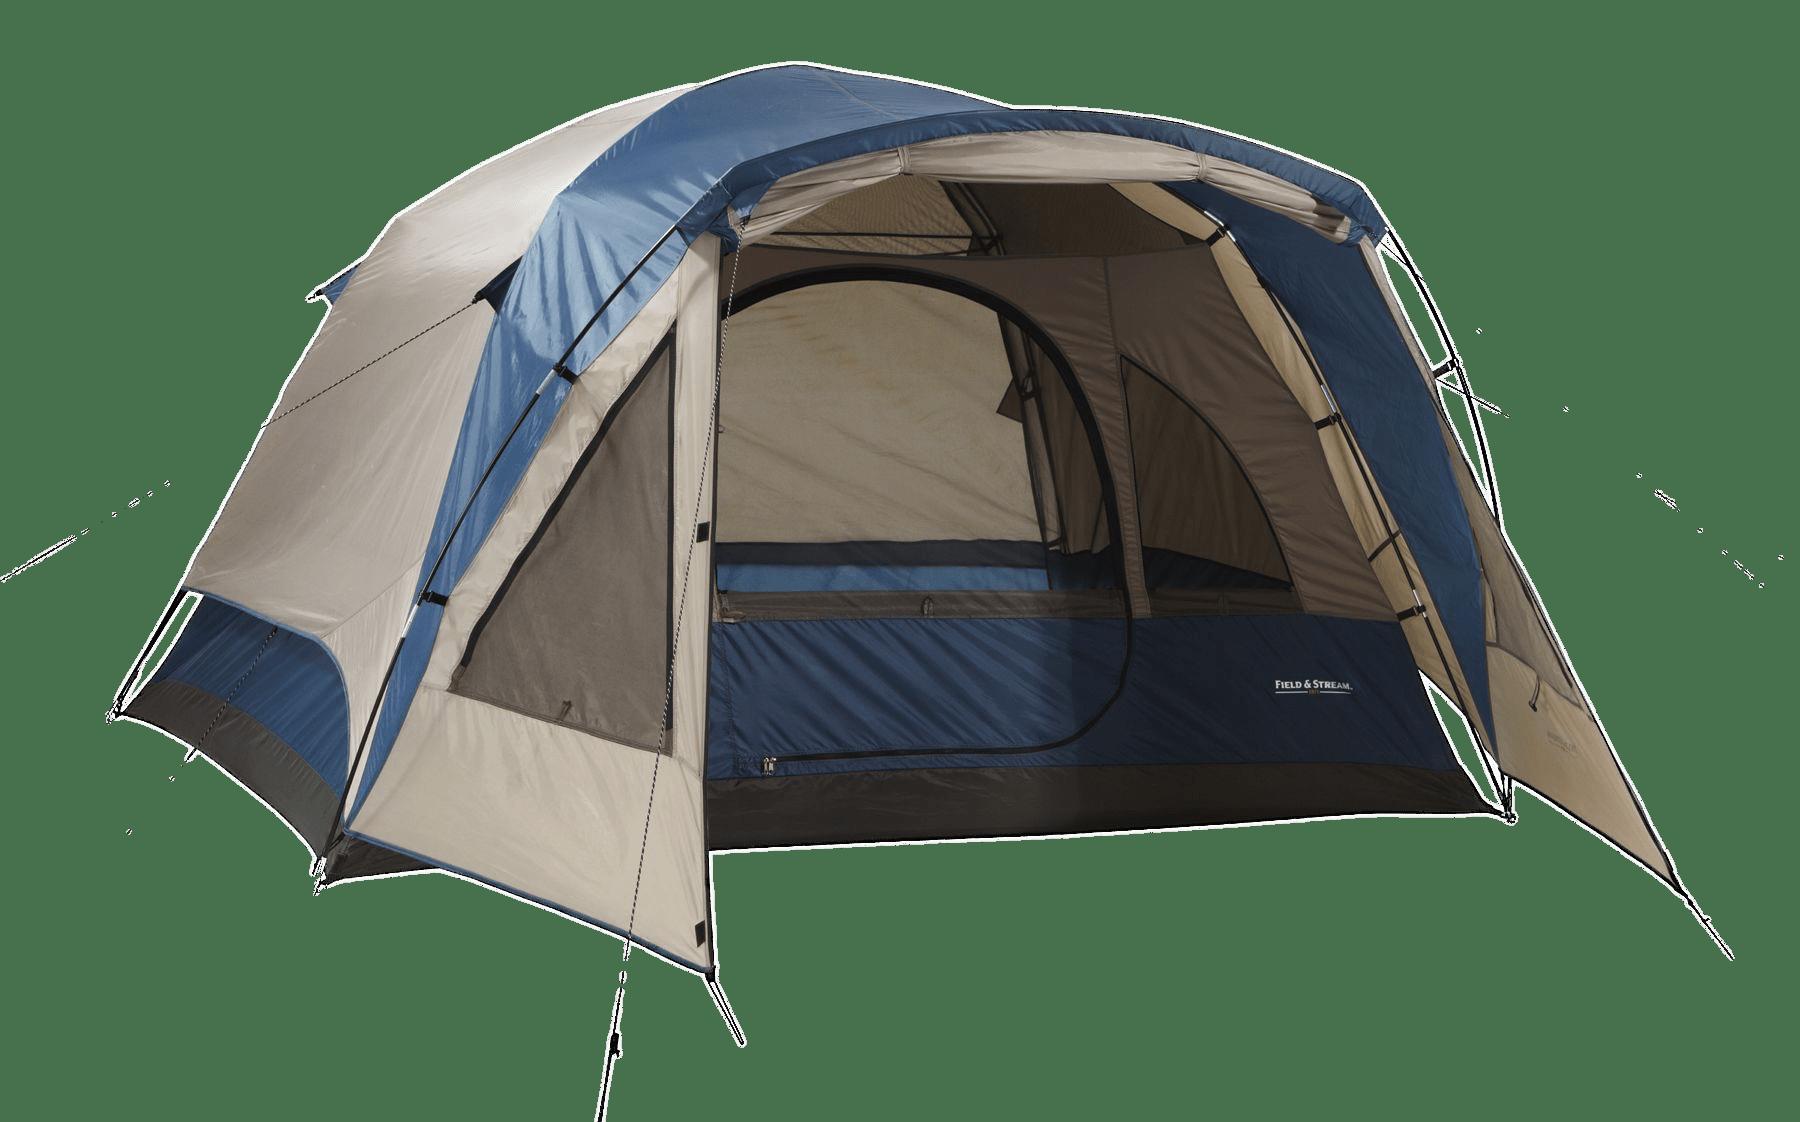 transparent download Transparent tent. Dome camping png stickpng.